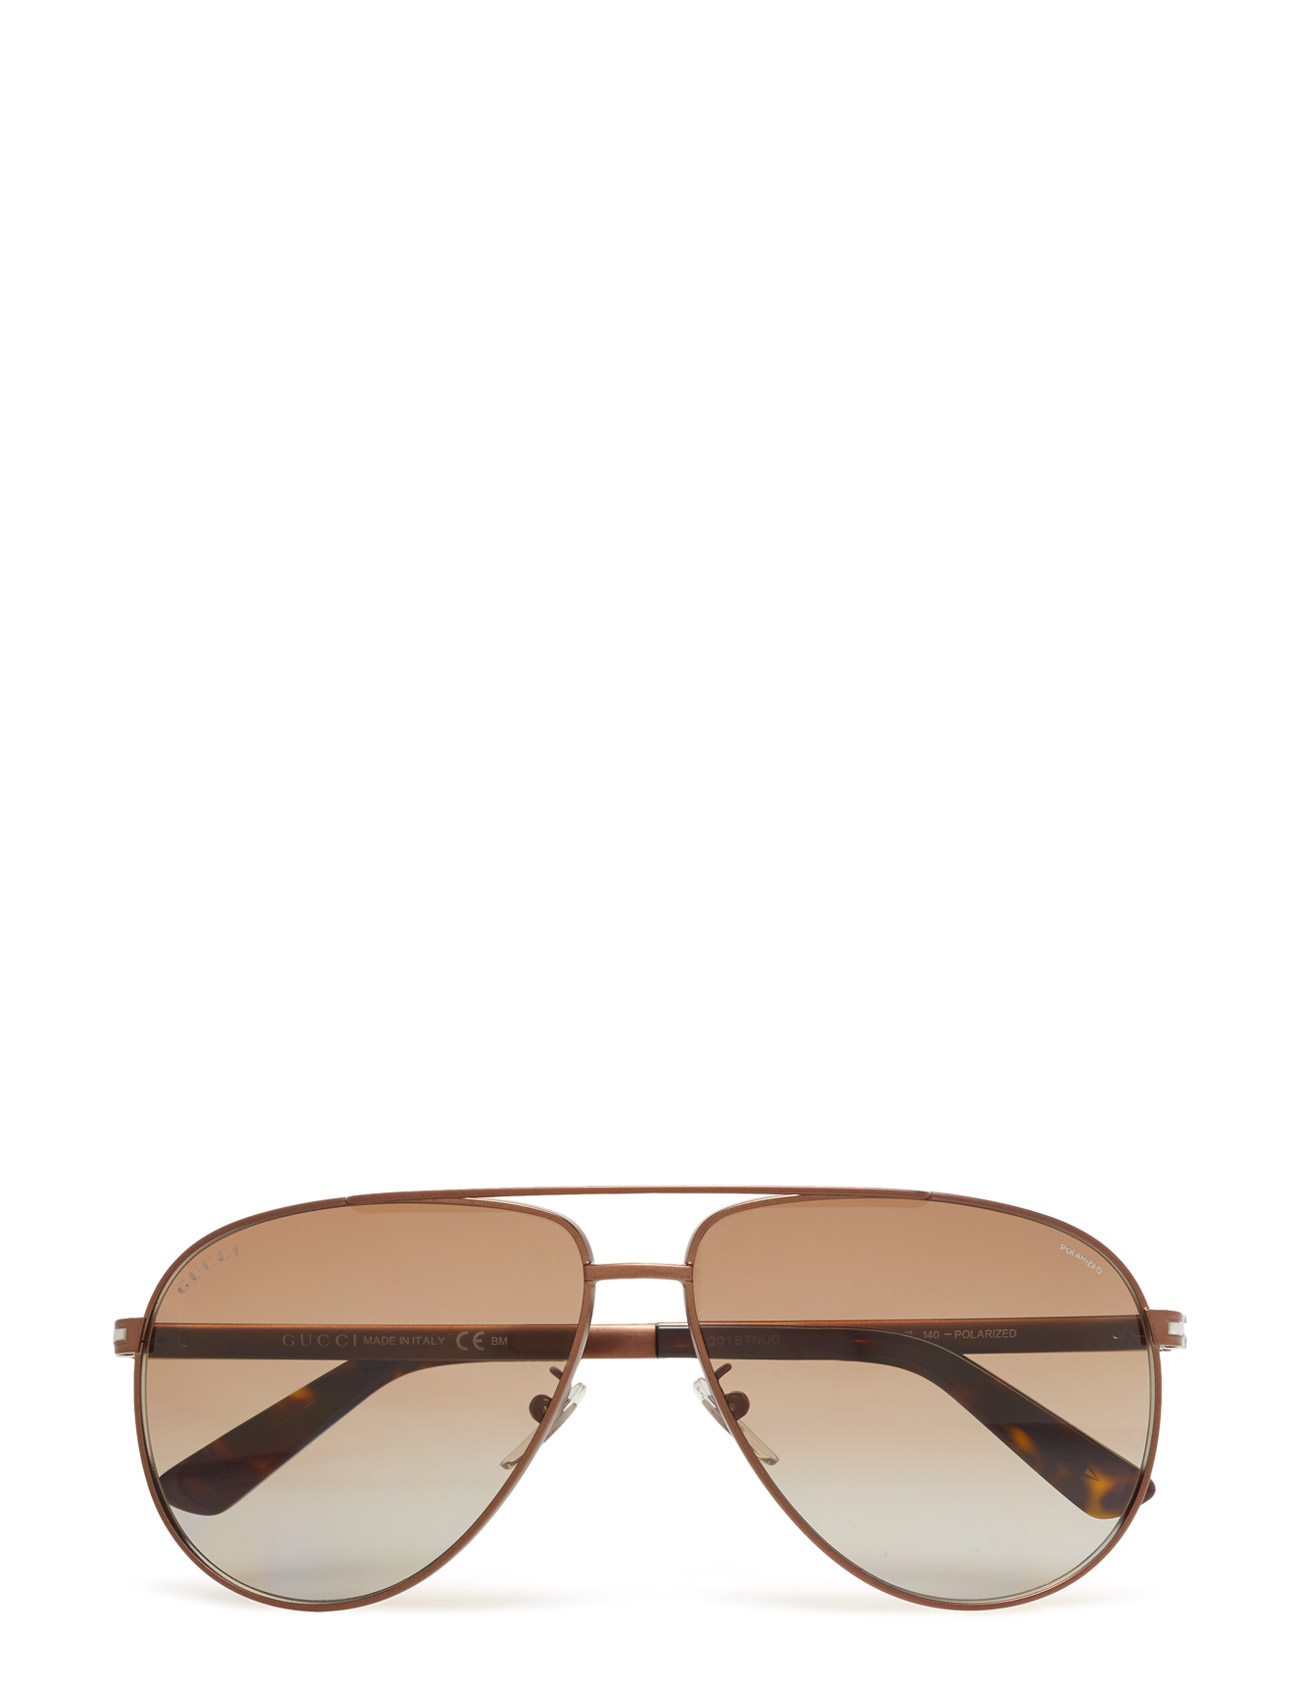 Gg 2269/S Gucci Sunglasses Accessories til Mænd i